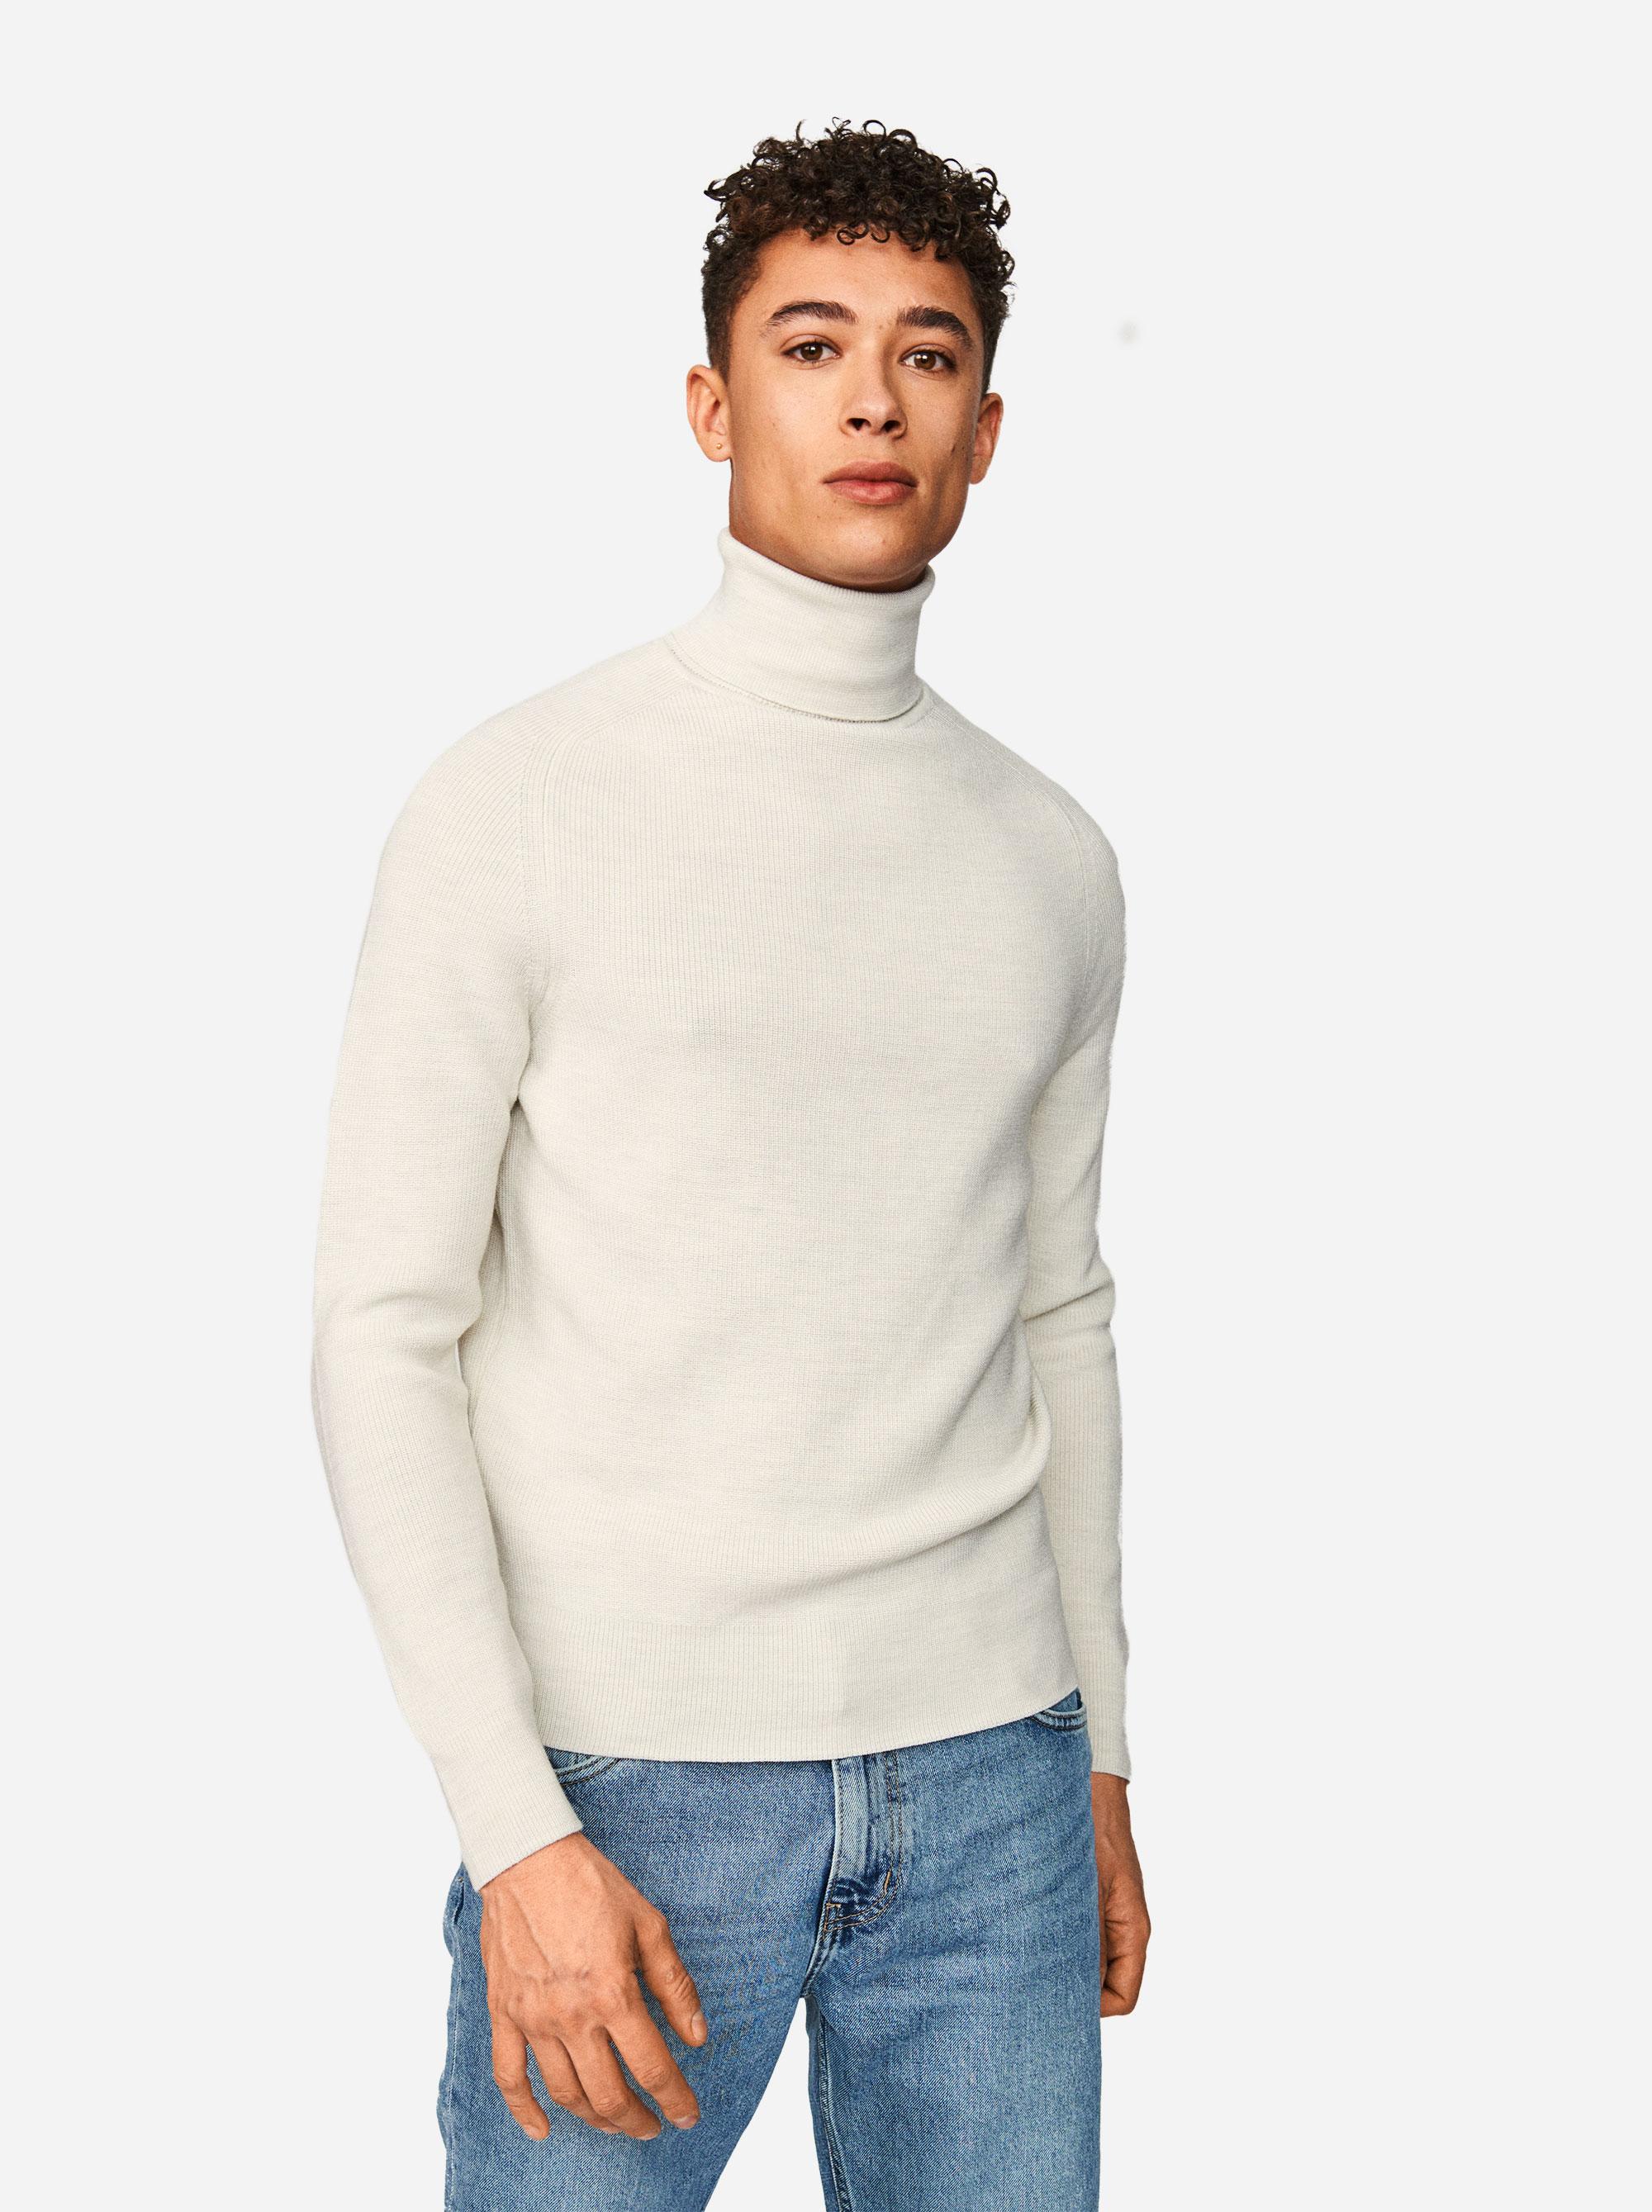 Teym - Turtleneck - The Merino Sweater - Men - White - 2